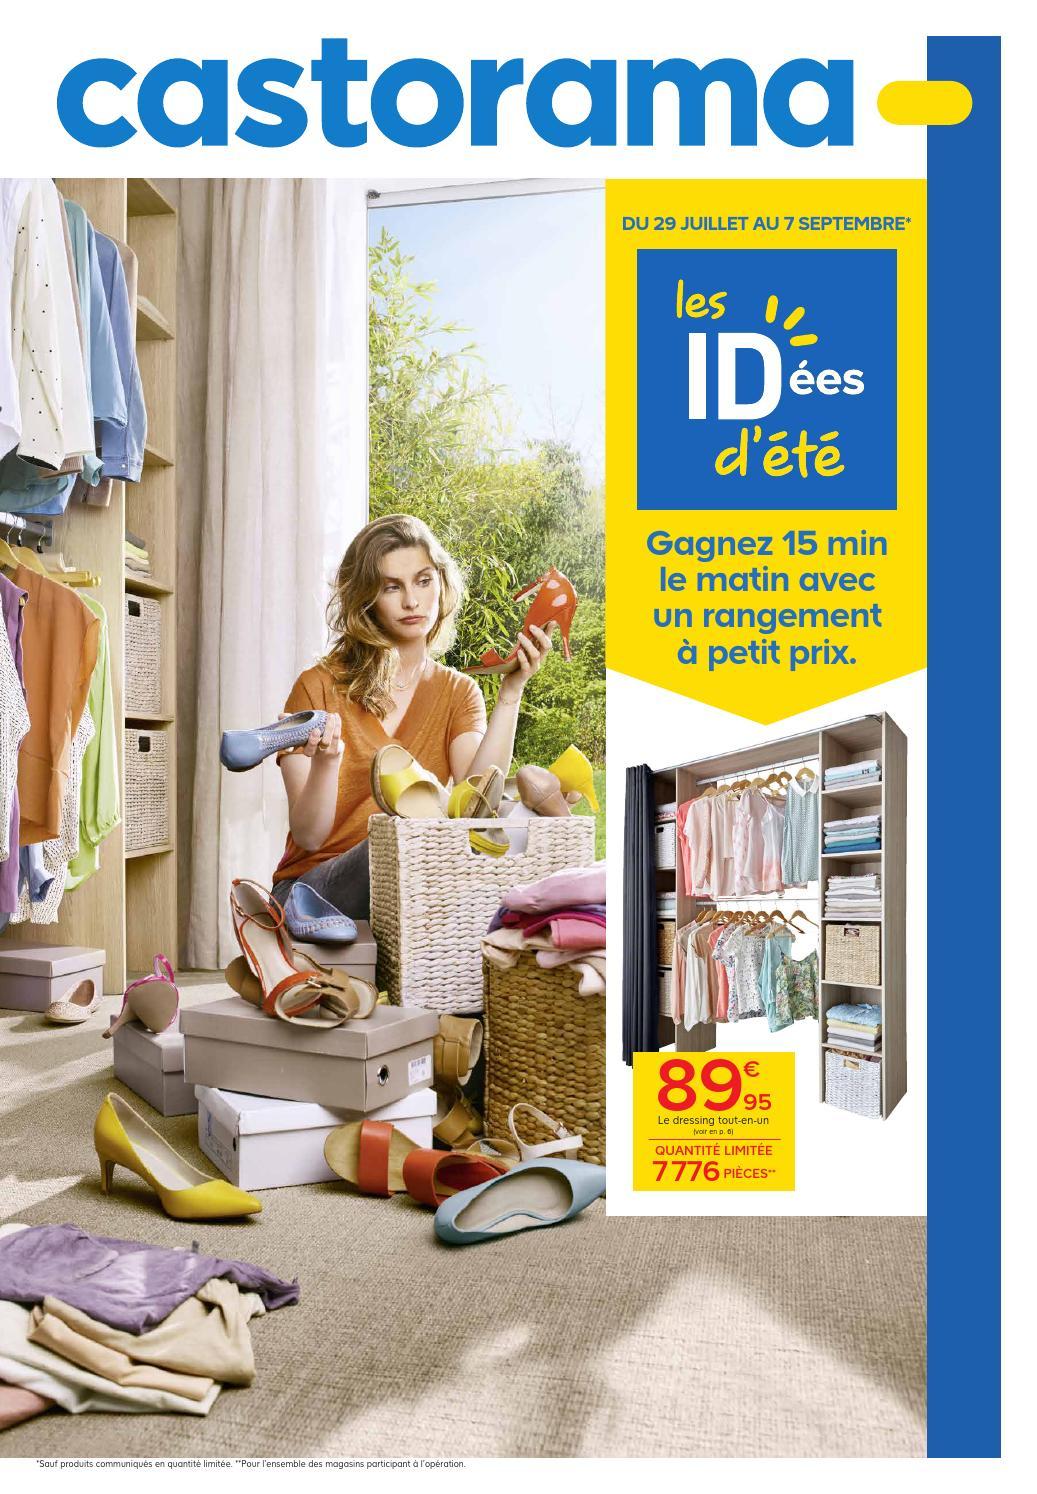 Castorama Catalogue 29Juillet 7Septembre2015 By ... concernant Epdm Toiture Castorama